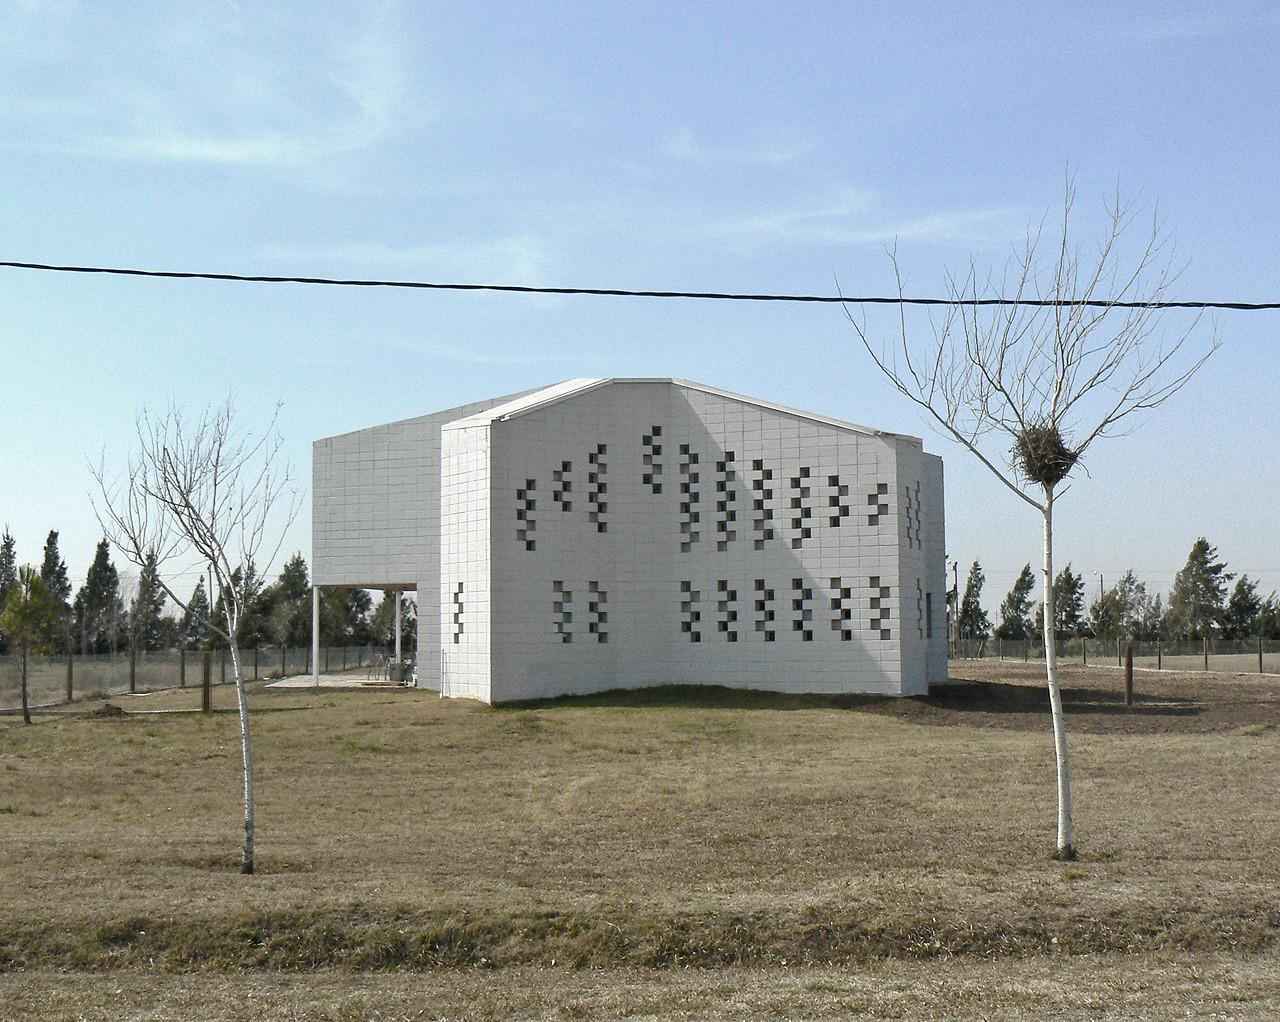 Casa Raigal / Marcelo Villafañe, © Walter G. Salcedo